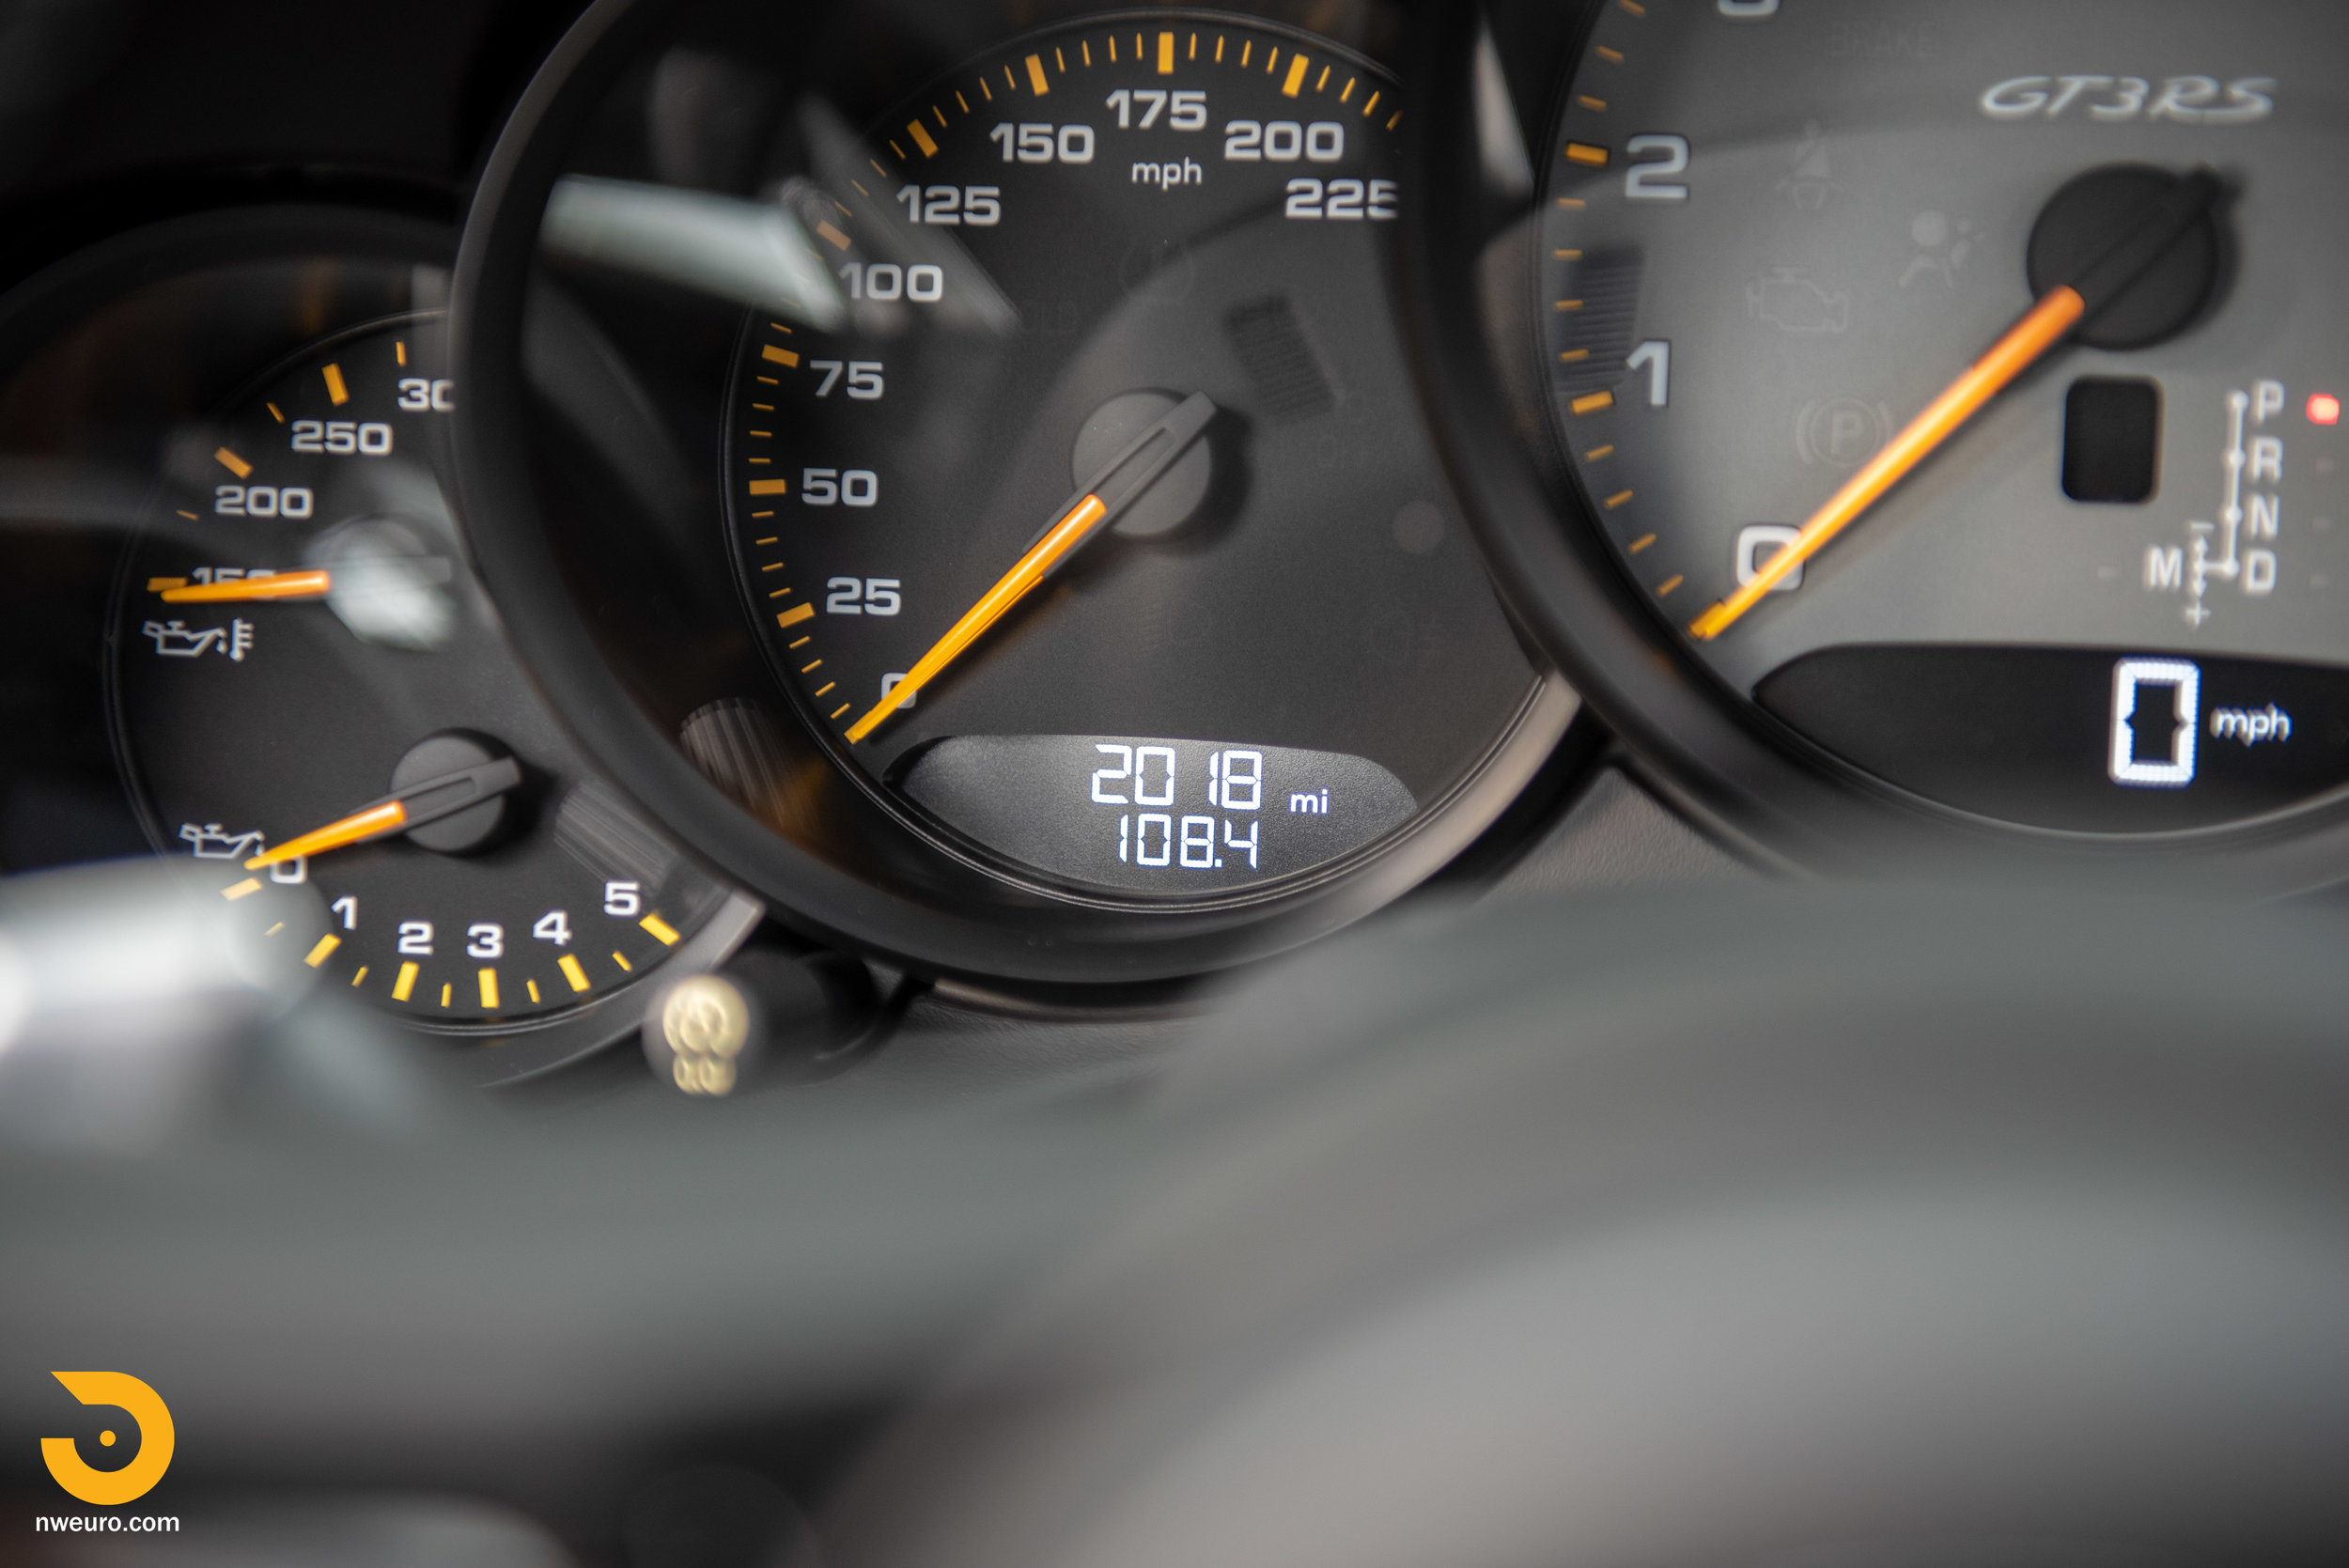 2019 Porsche GT3 RS - Chalk-30.jpg